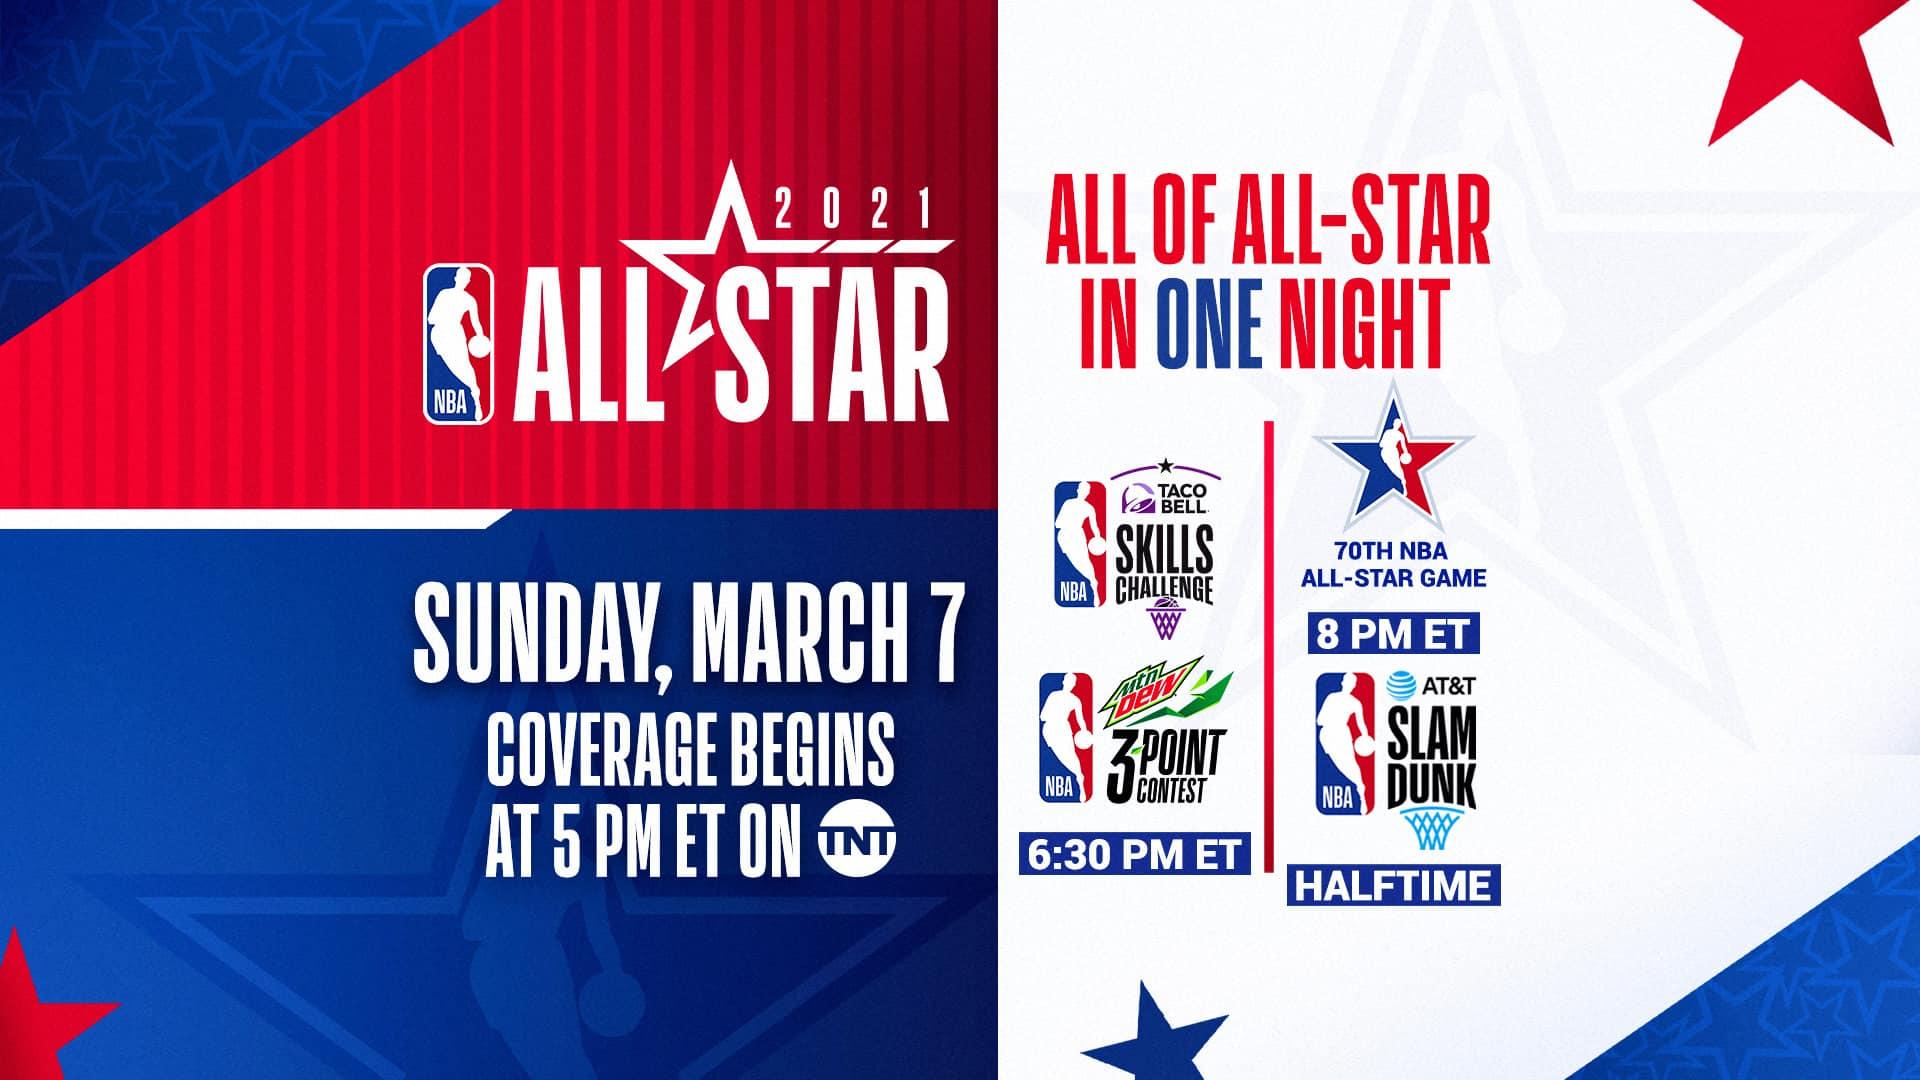 Ponturi All Star Game NBA 2021